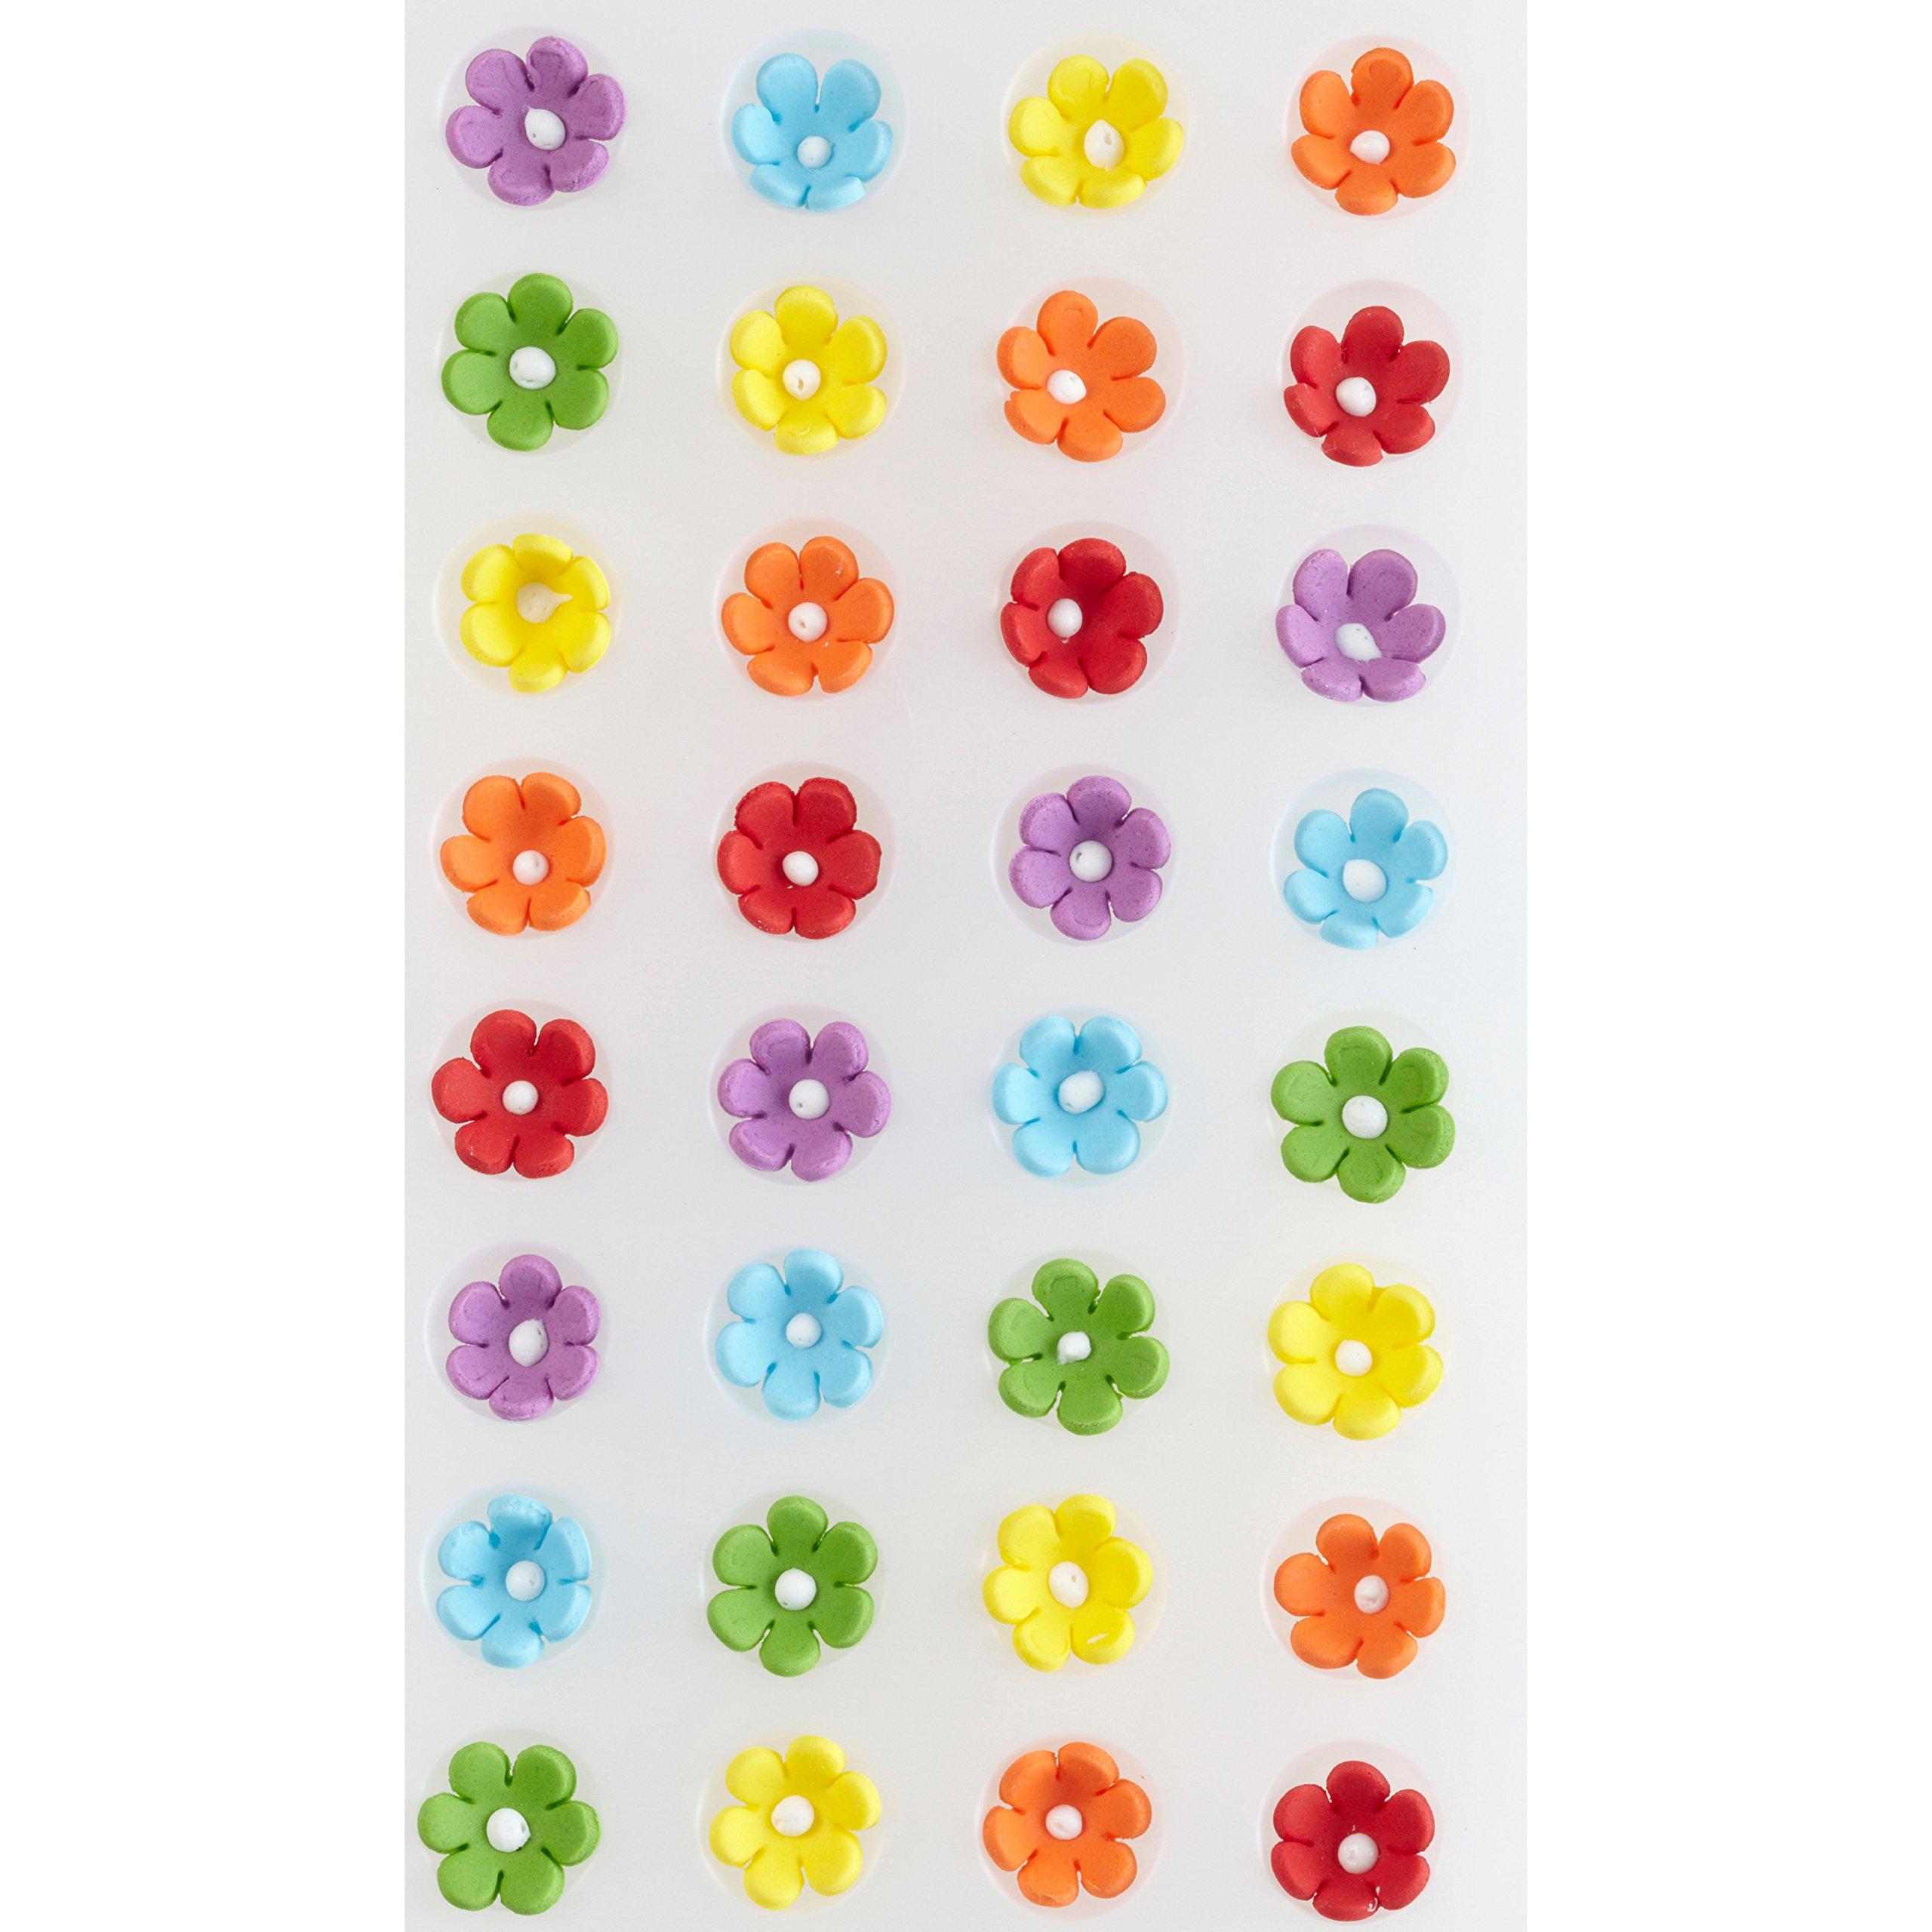 Wilton 710-2215 Icing Decoration, Royal Flower Rainbow, Mini